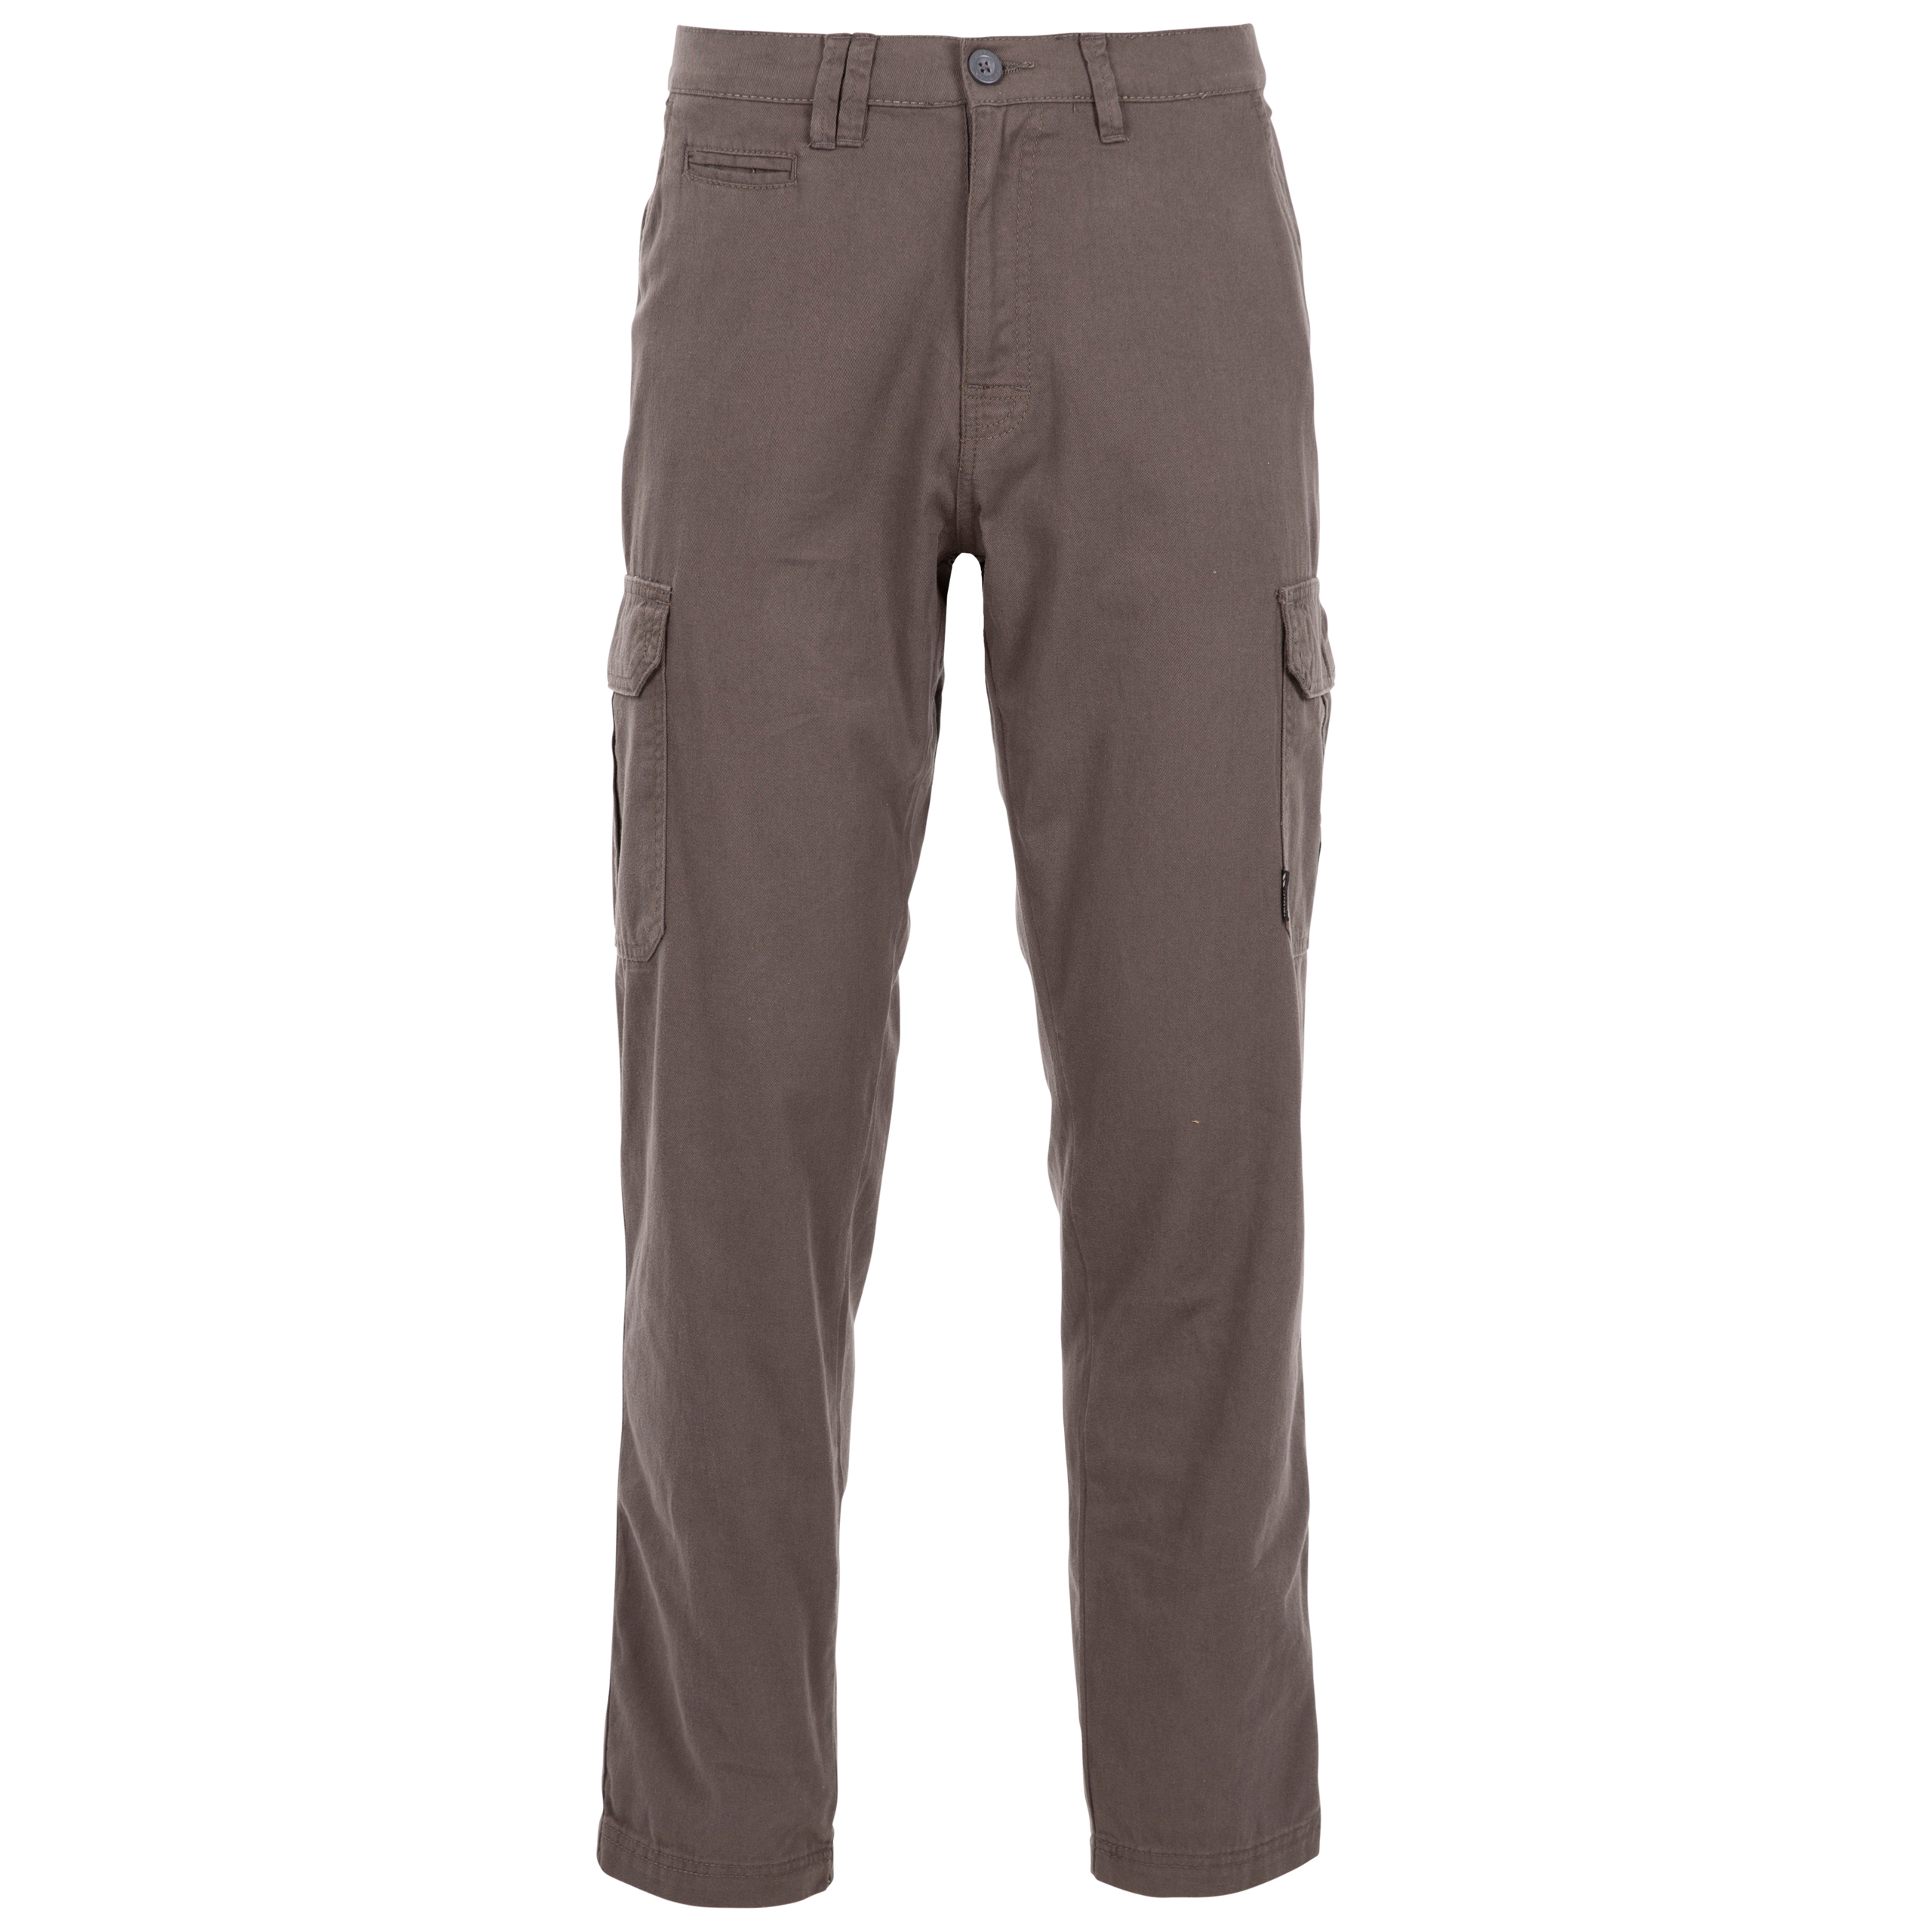 Trespass-Tipner-Mens-Walking-Hiking-Pants-Cotton-Breathable-Trousers thumbnail 14